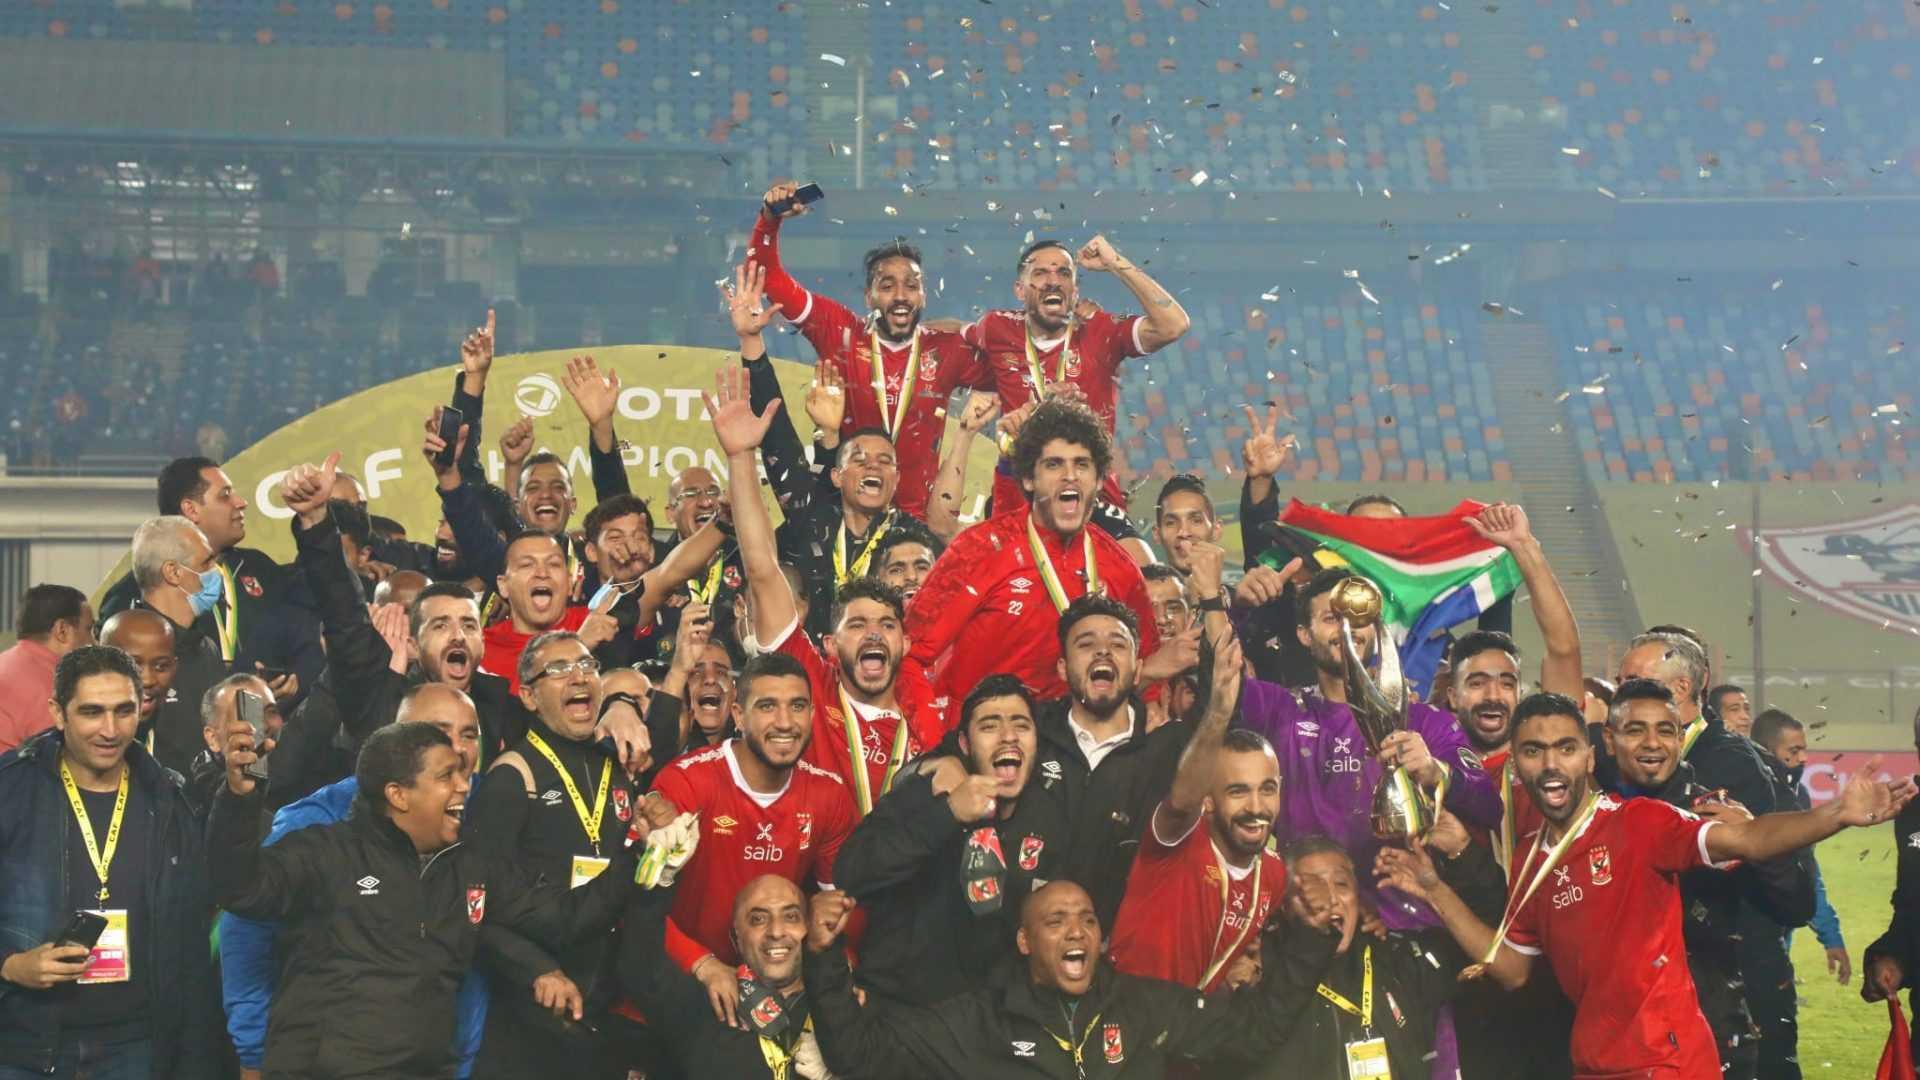 Champions League africana, l'Al-Ahly vince il decimo titolo